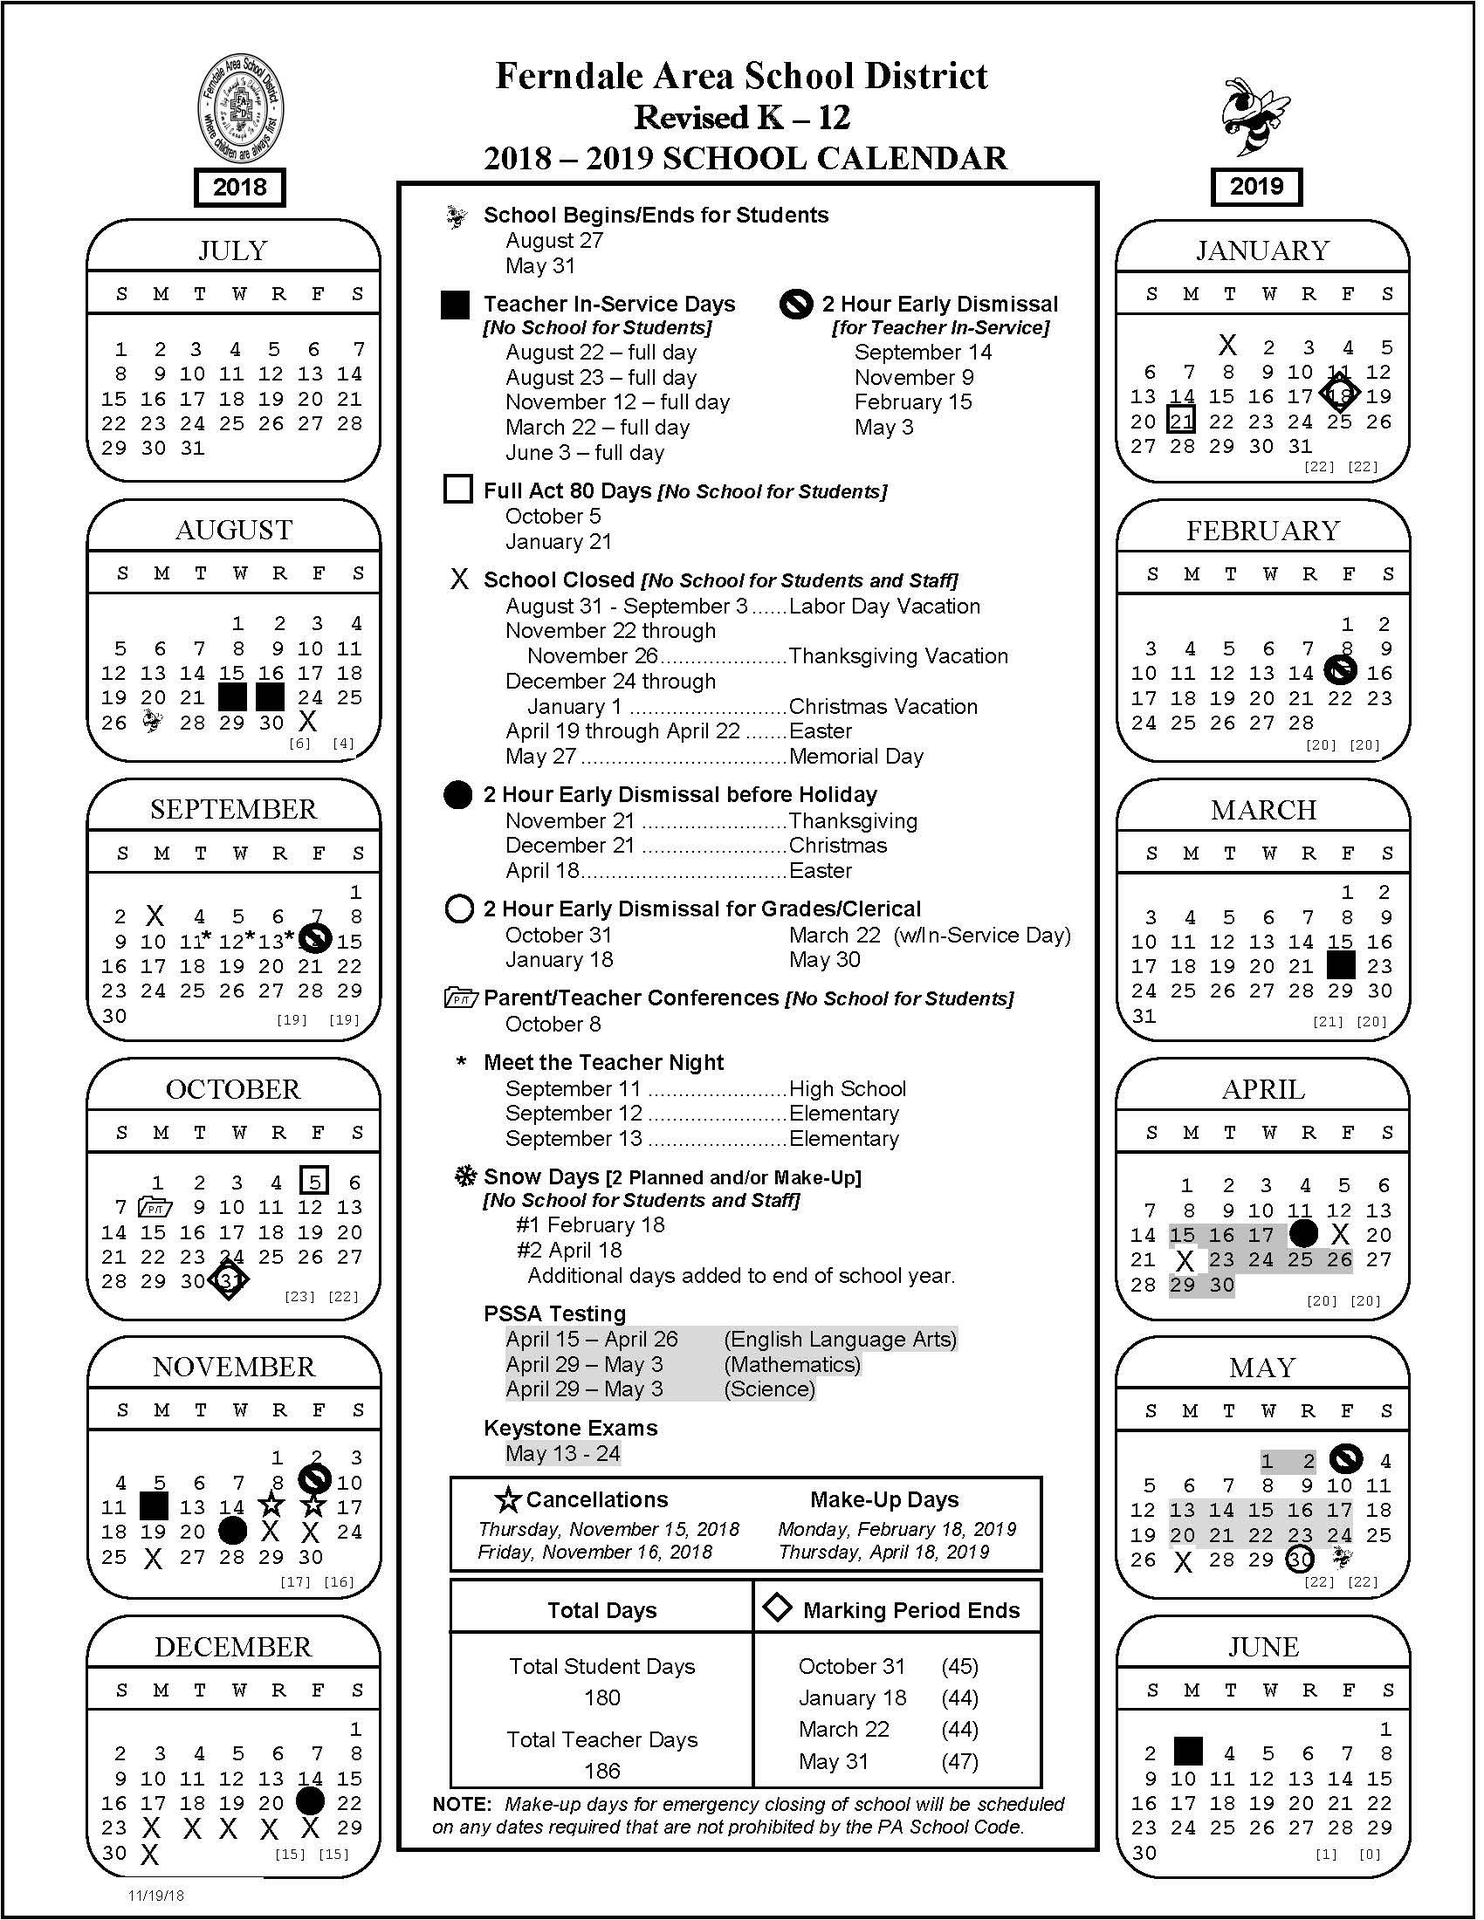 K-12 Revised School Calendar